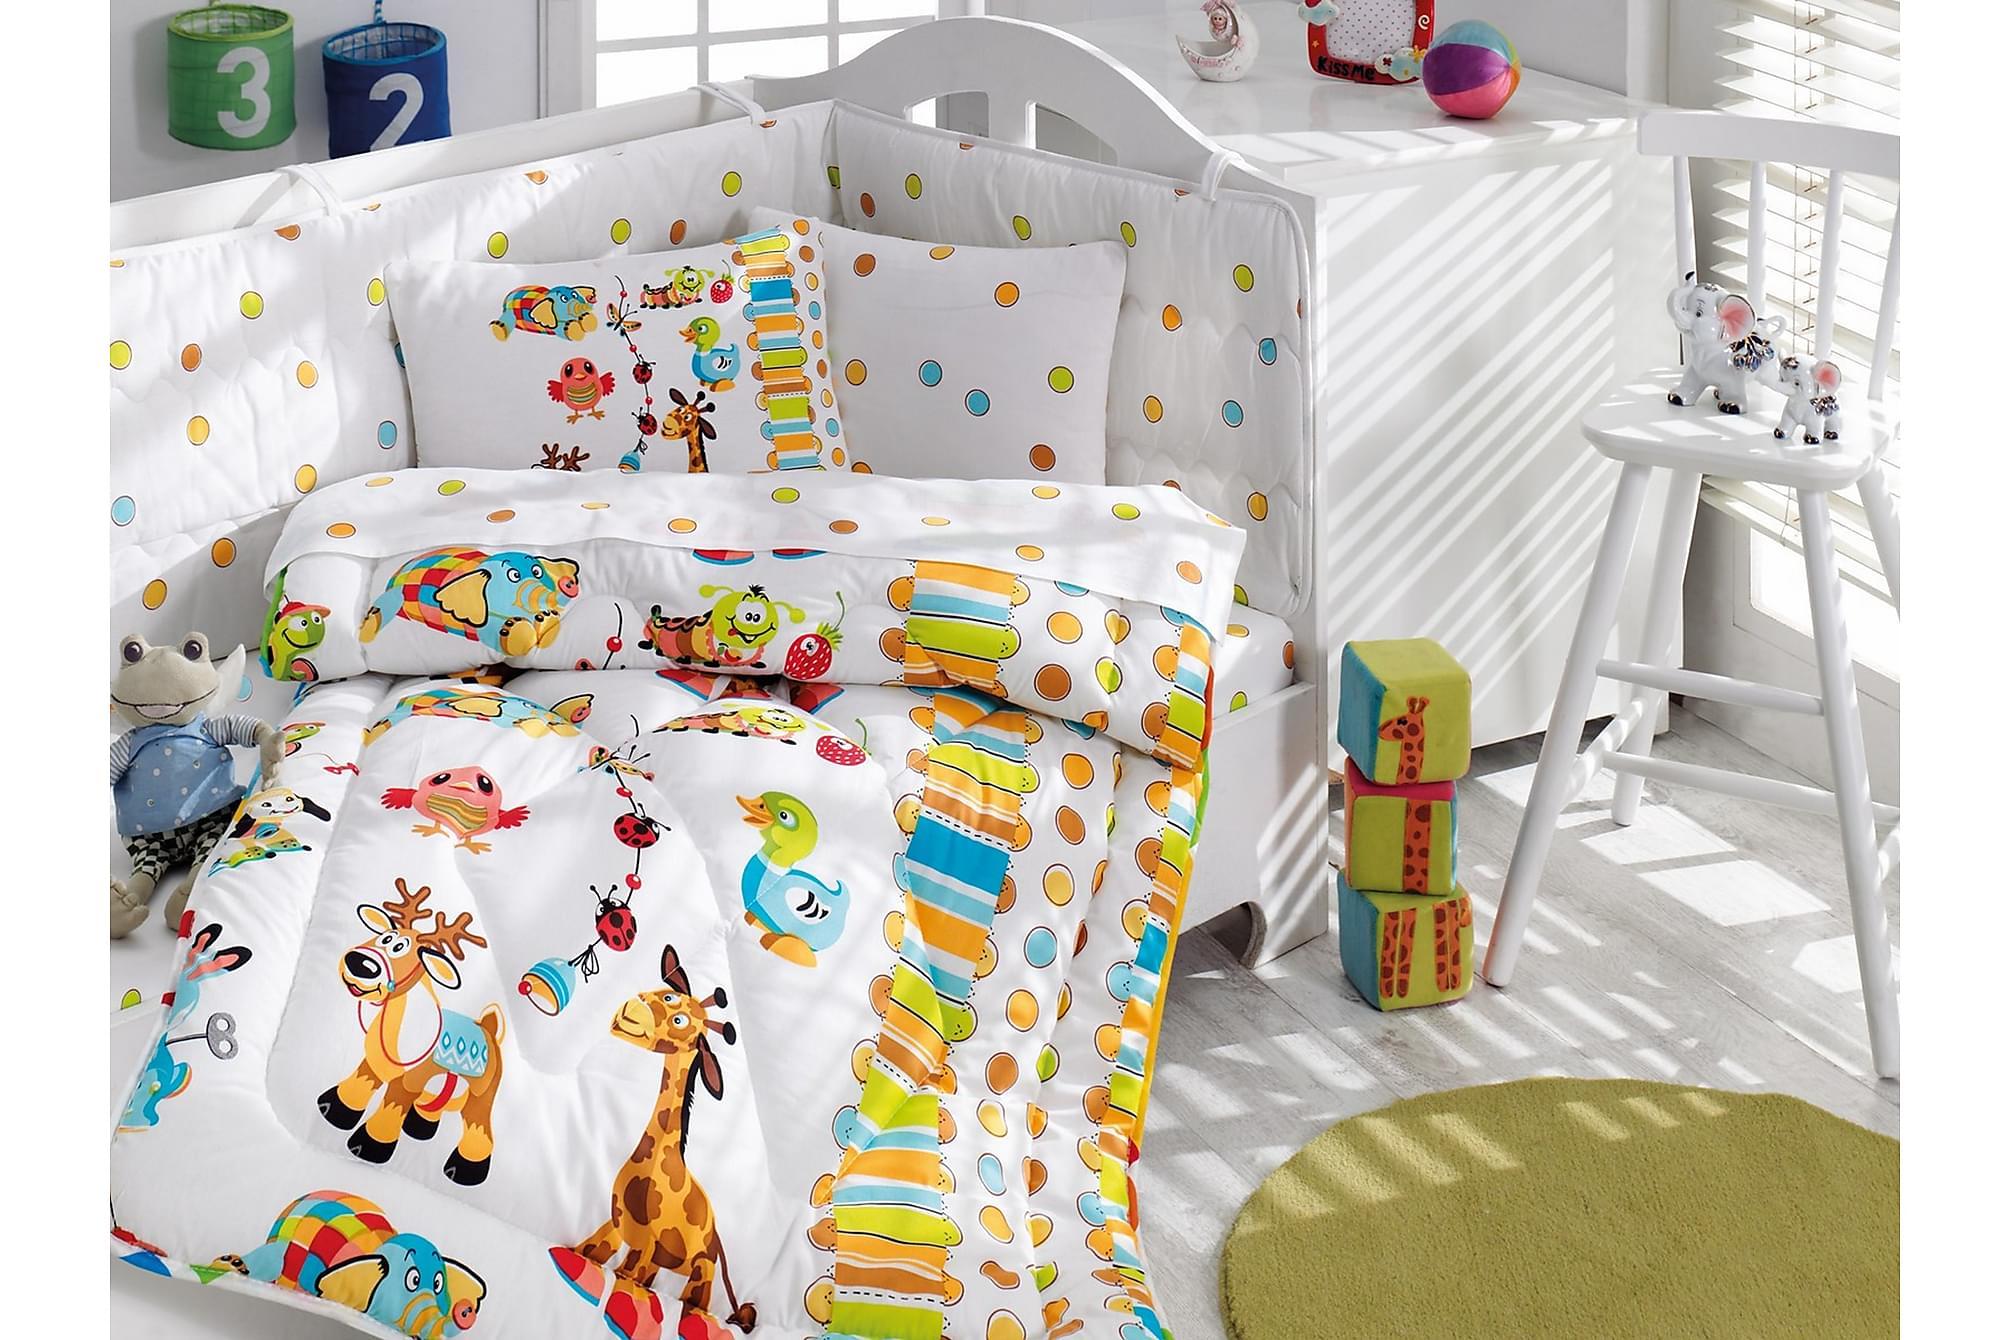 COTTON BOX Sovpaket Baby 6 Delar Ranforce Vit/Turkos/Multi